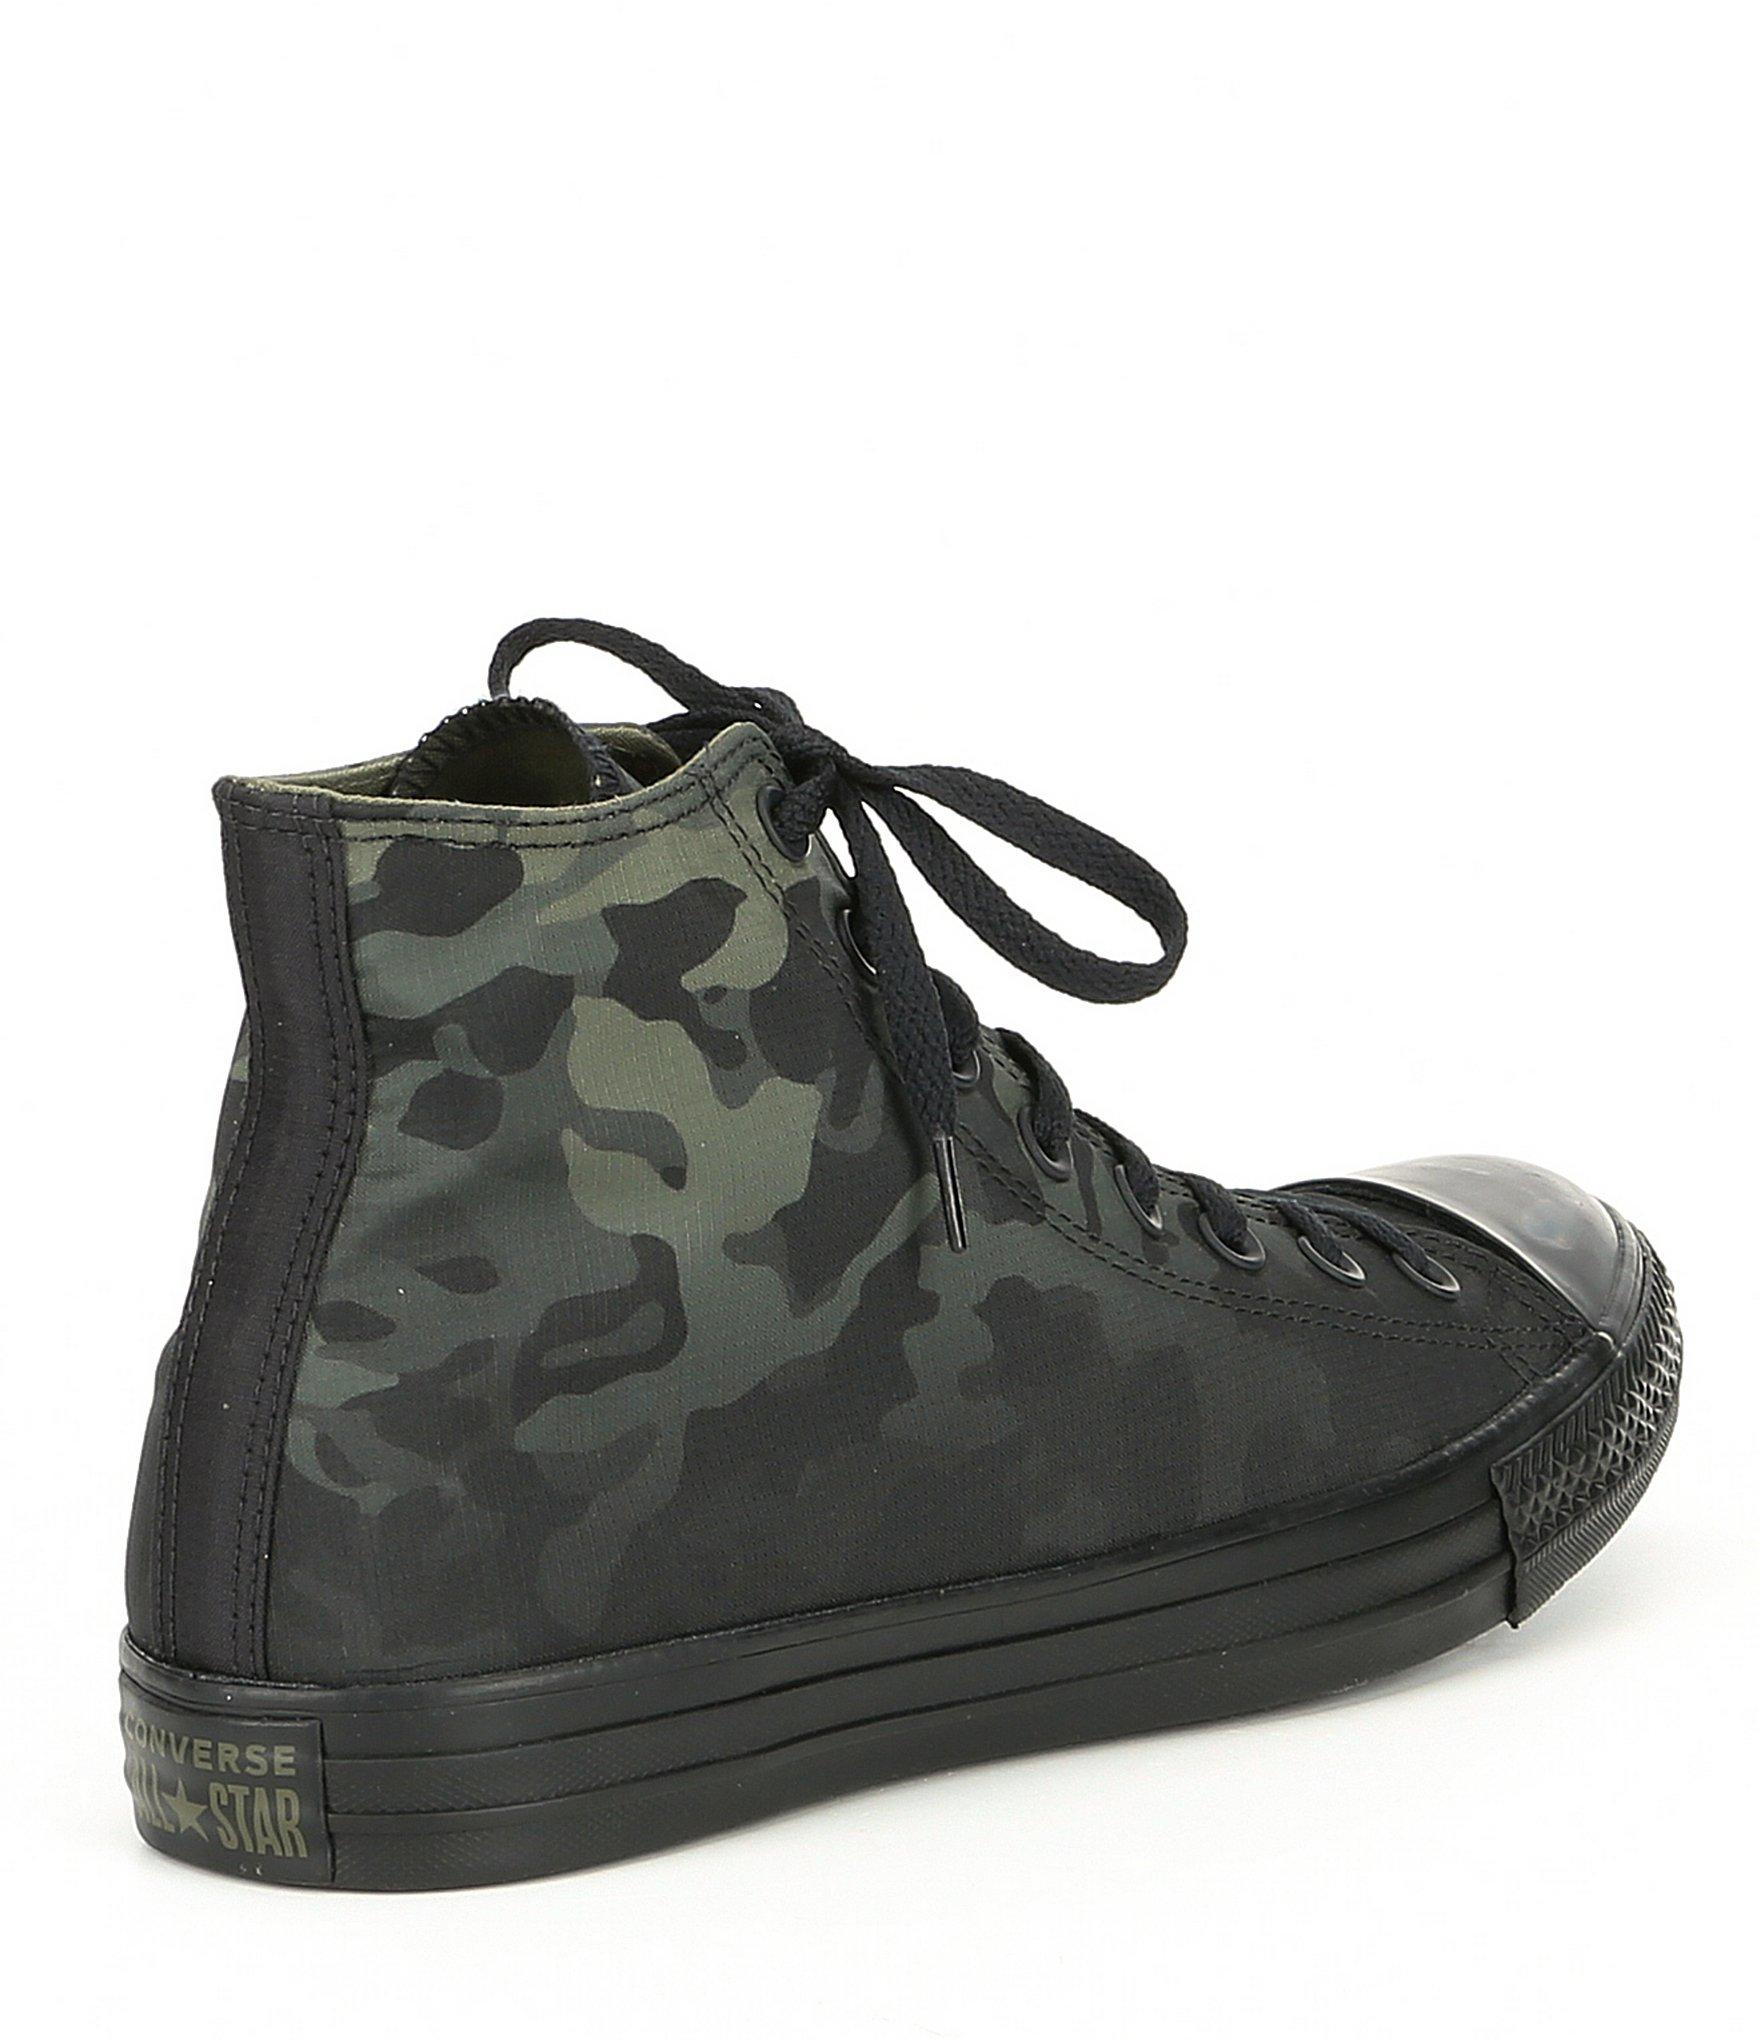 b02af91af93 Converse - Black Men's Chuck Taylor All Star Camouflage High Top for Men -  Lyst. View fullscreen